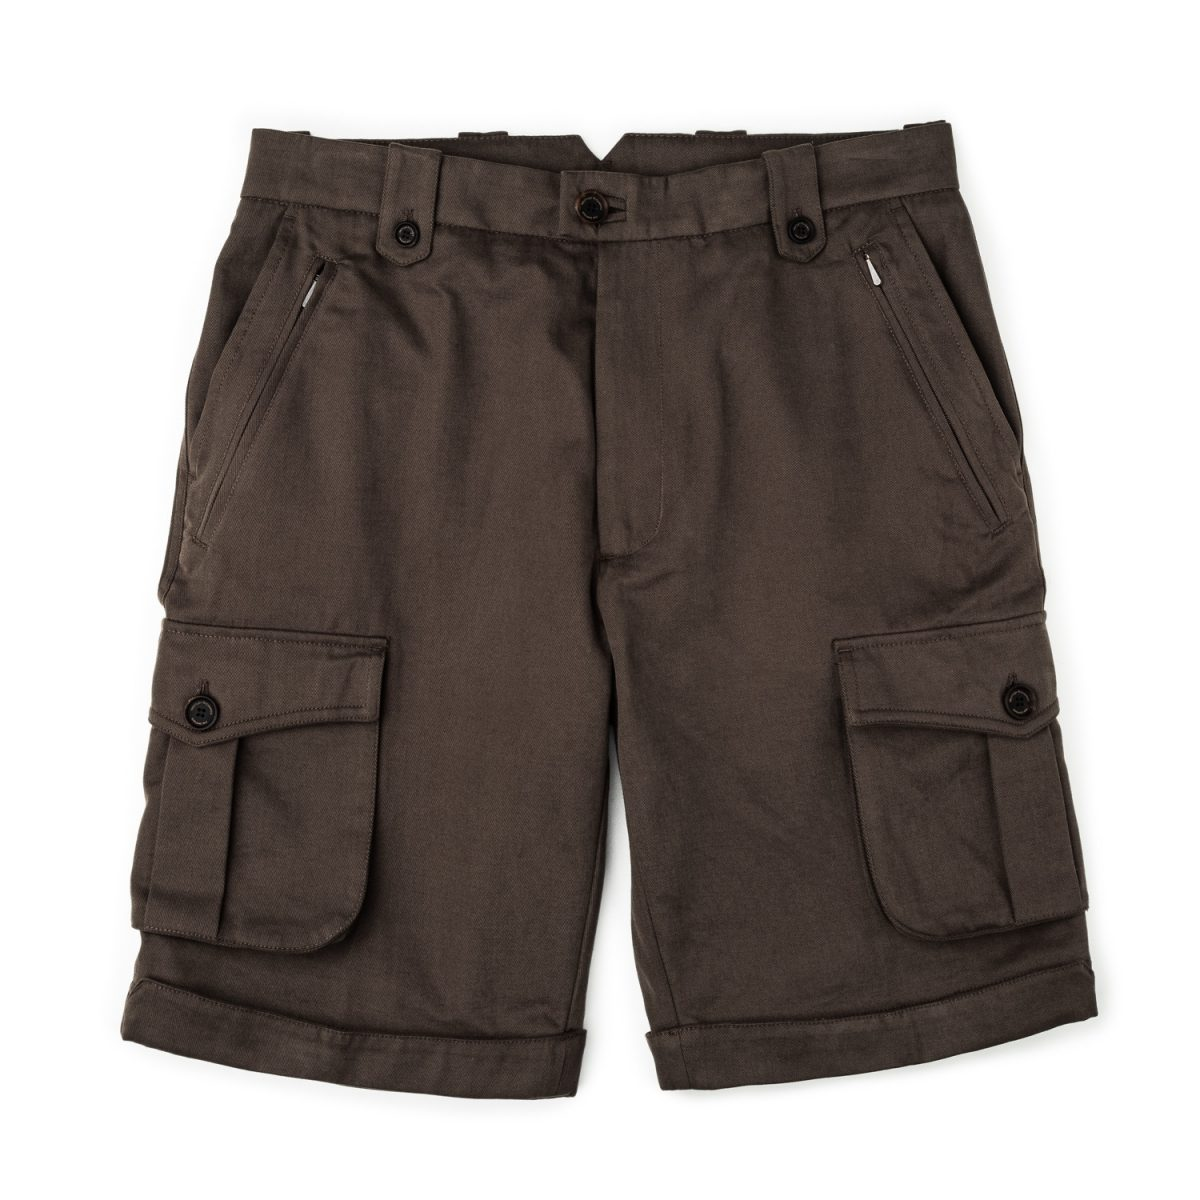 wr_new_safari_shorts_trousers-3353-edit_1